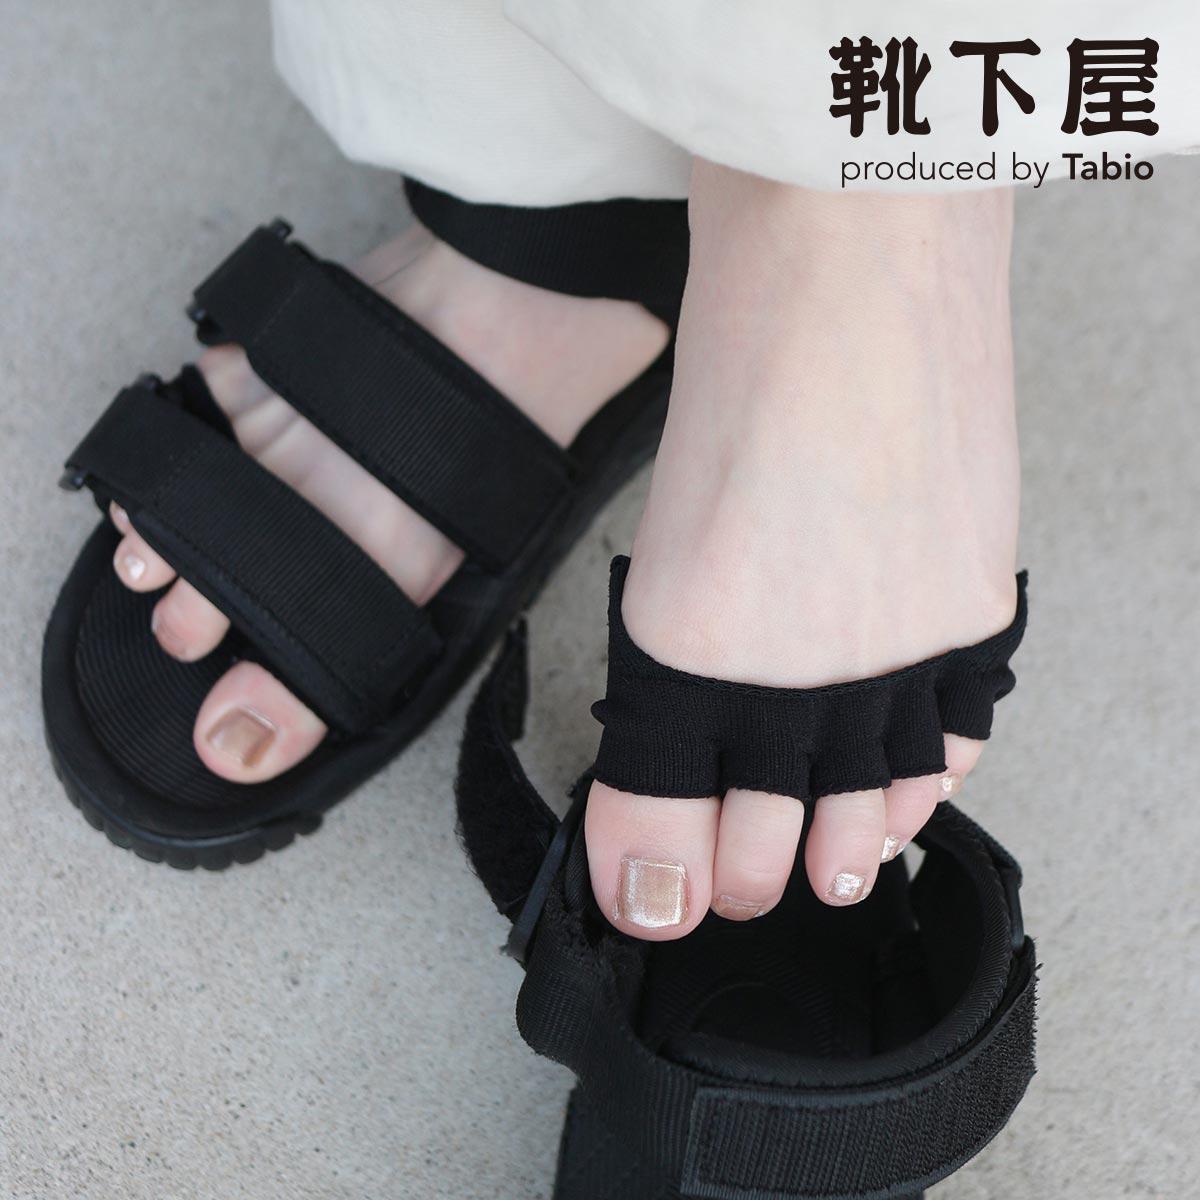 TABIO LEG LABO 浅履き指切りハーフソックス 靴下屋 靴下 タビオ Tabio くつ下 新品未使用正規品 あす楽 レディース 休み 5本指靴下 5本指 五本指靴下 五本指 日本製 五本指ソックス 5本指ソックス